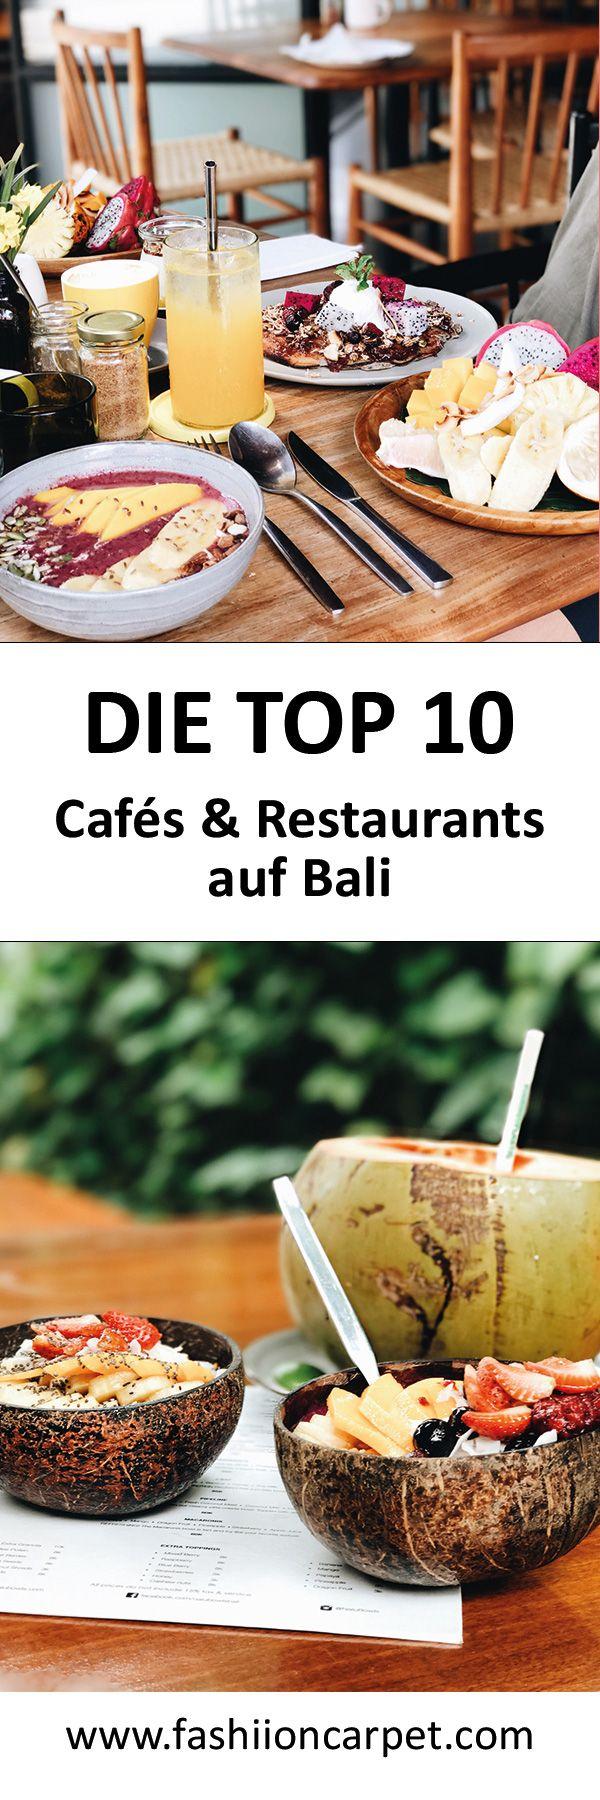 Die besten Restaurants & Frühstück Cafés in Bali (Canggu, Ubud, Uluwatu & Seminyak)